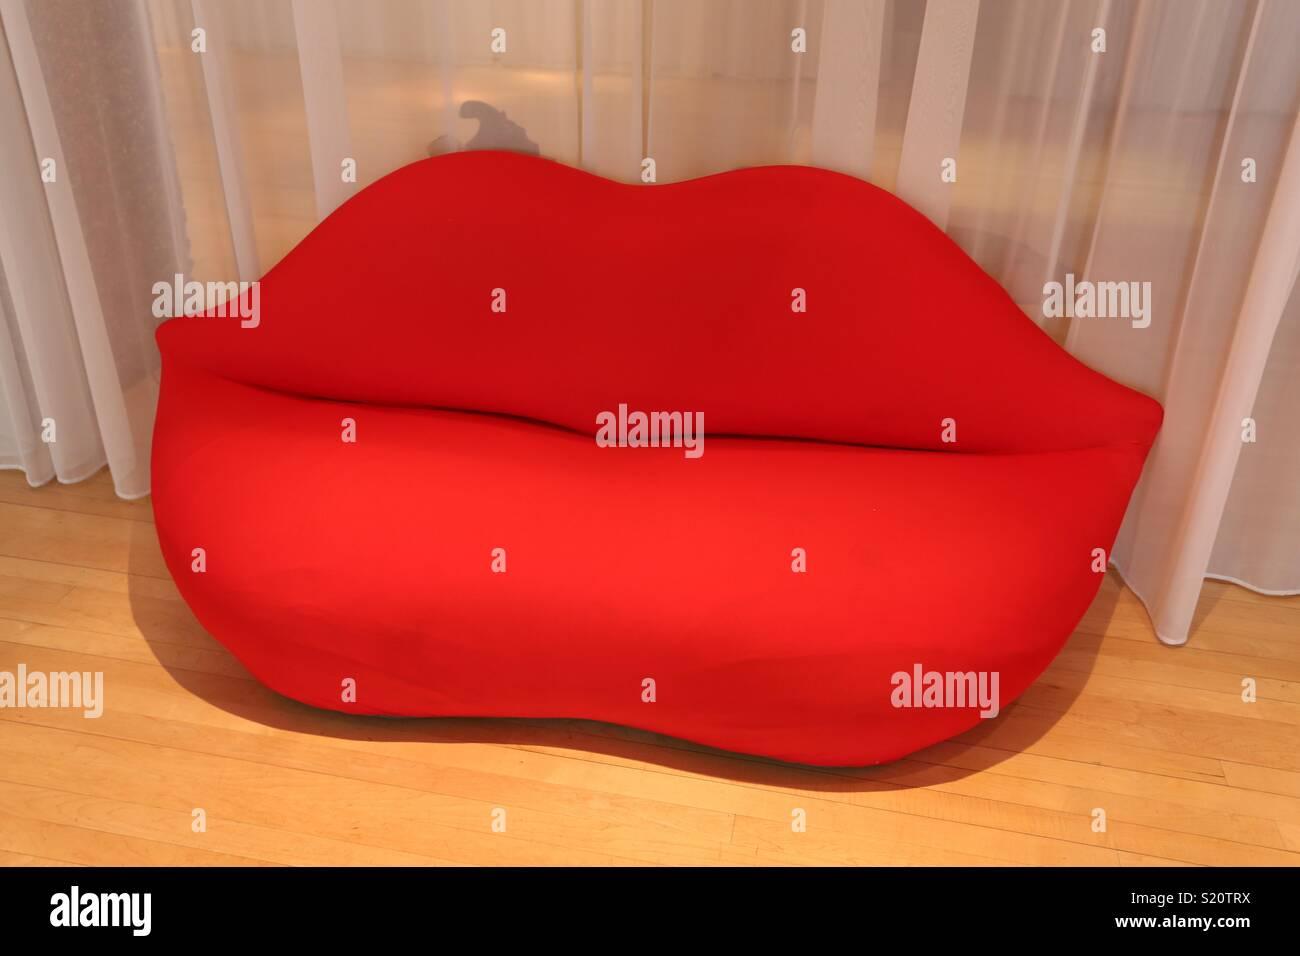 Red Lips Sofa   Stock Image